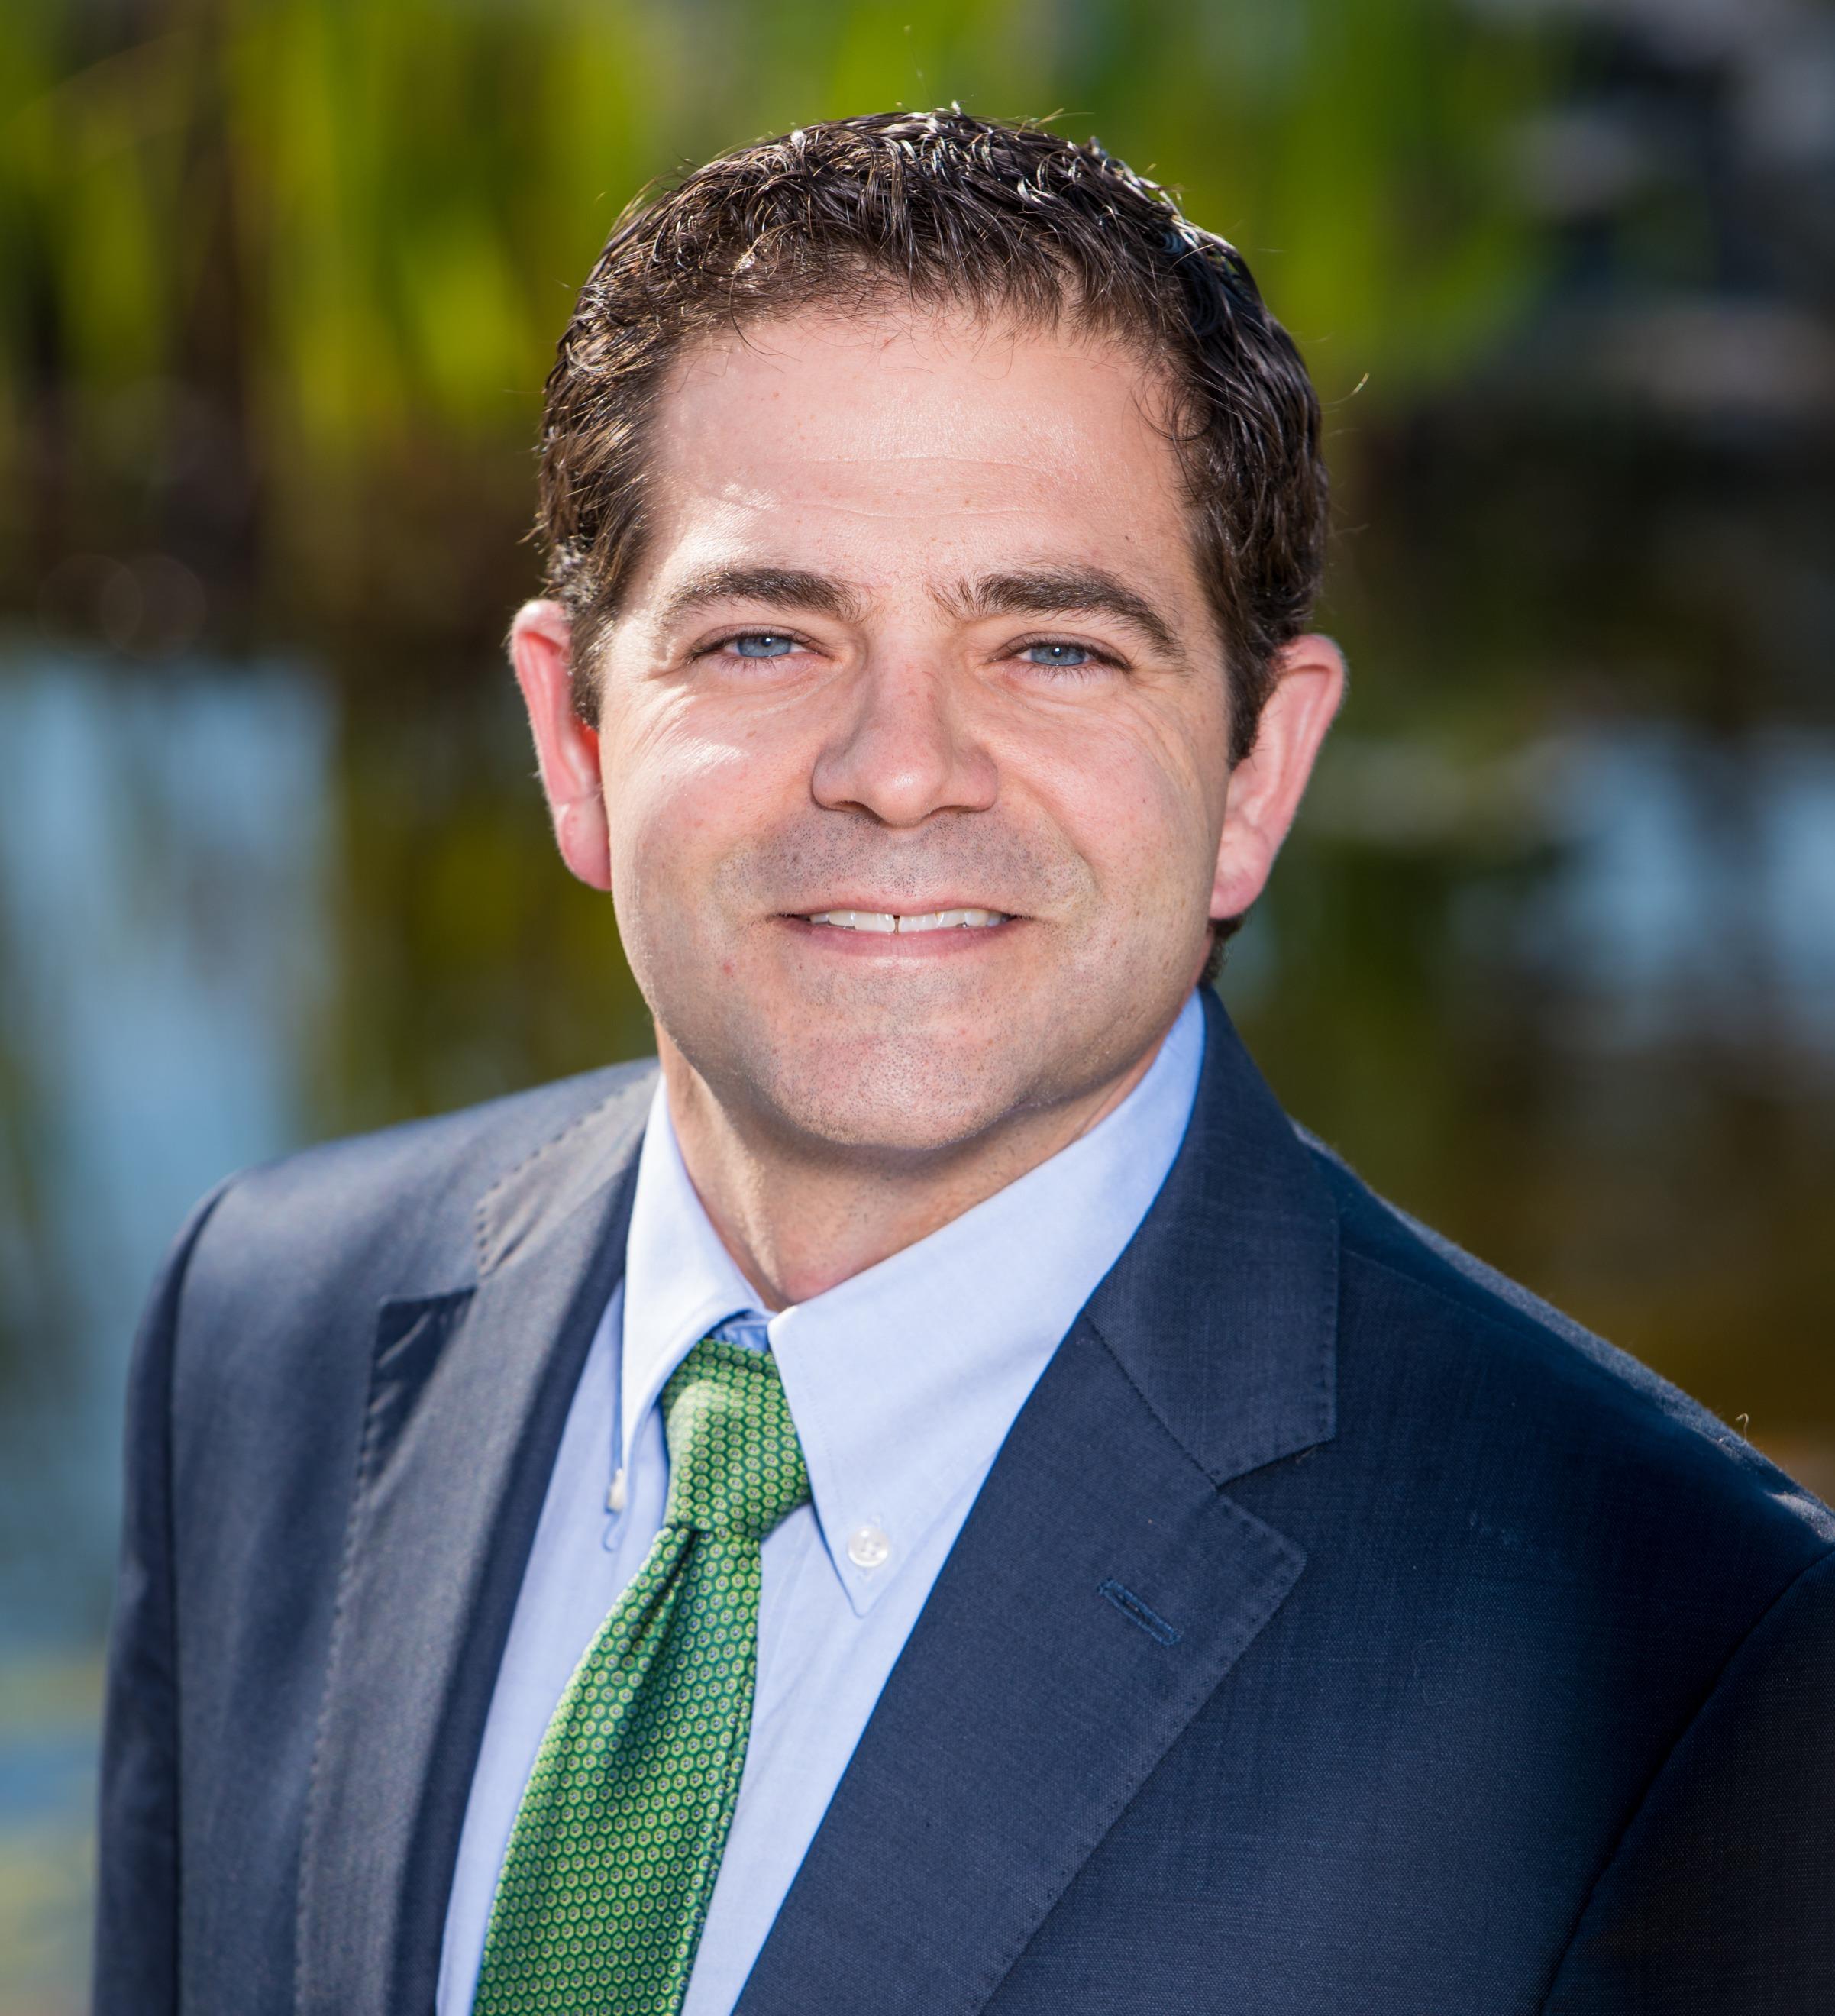 Michael Fayard's Profile Image